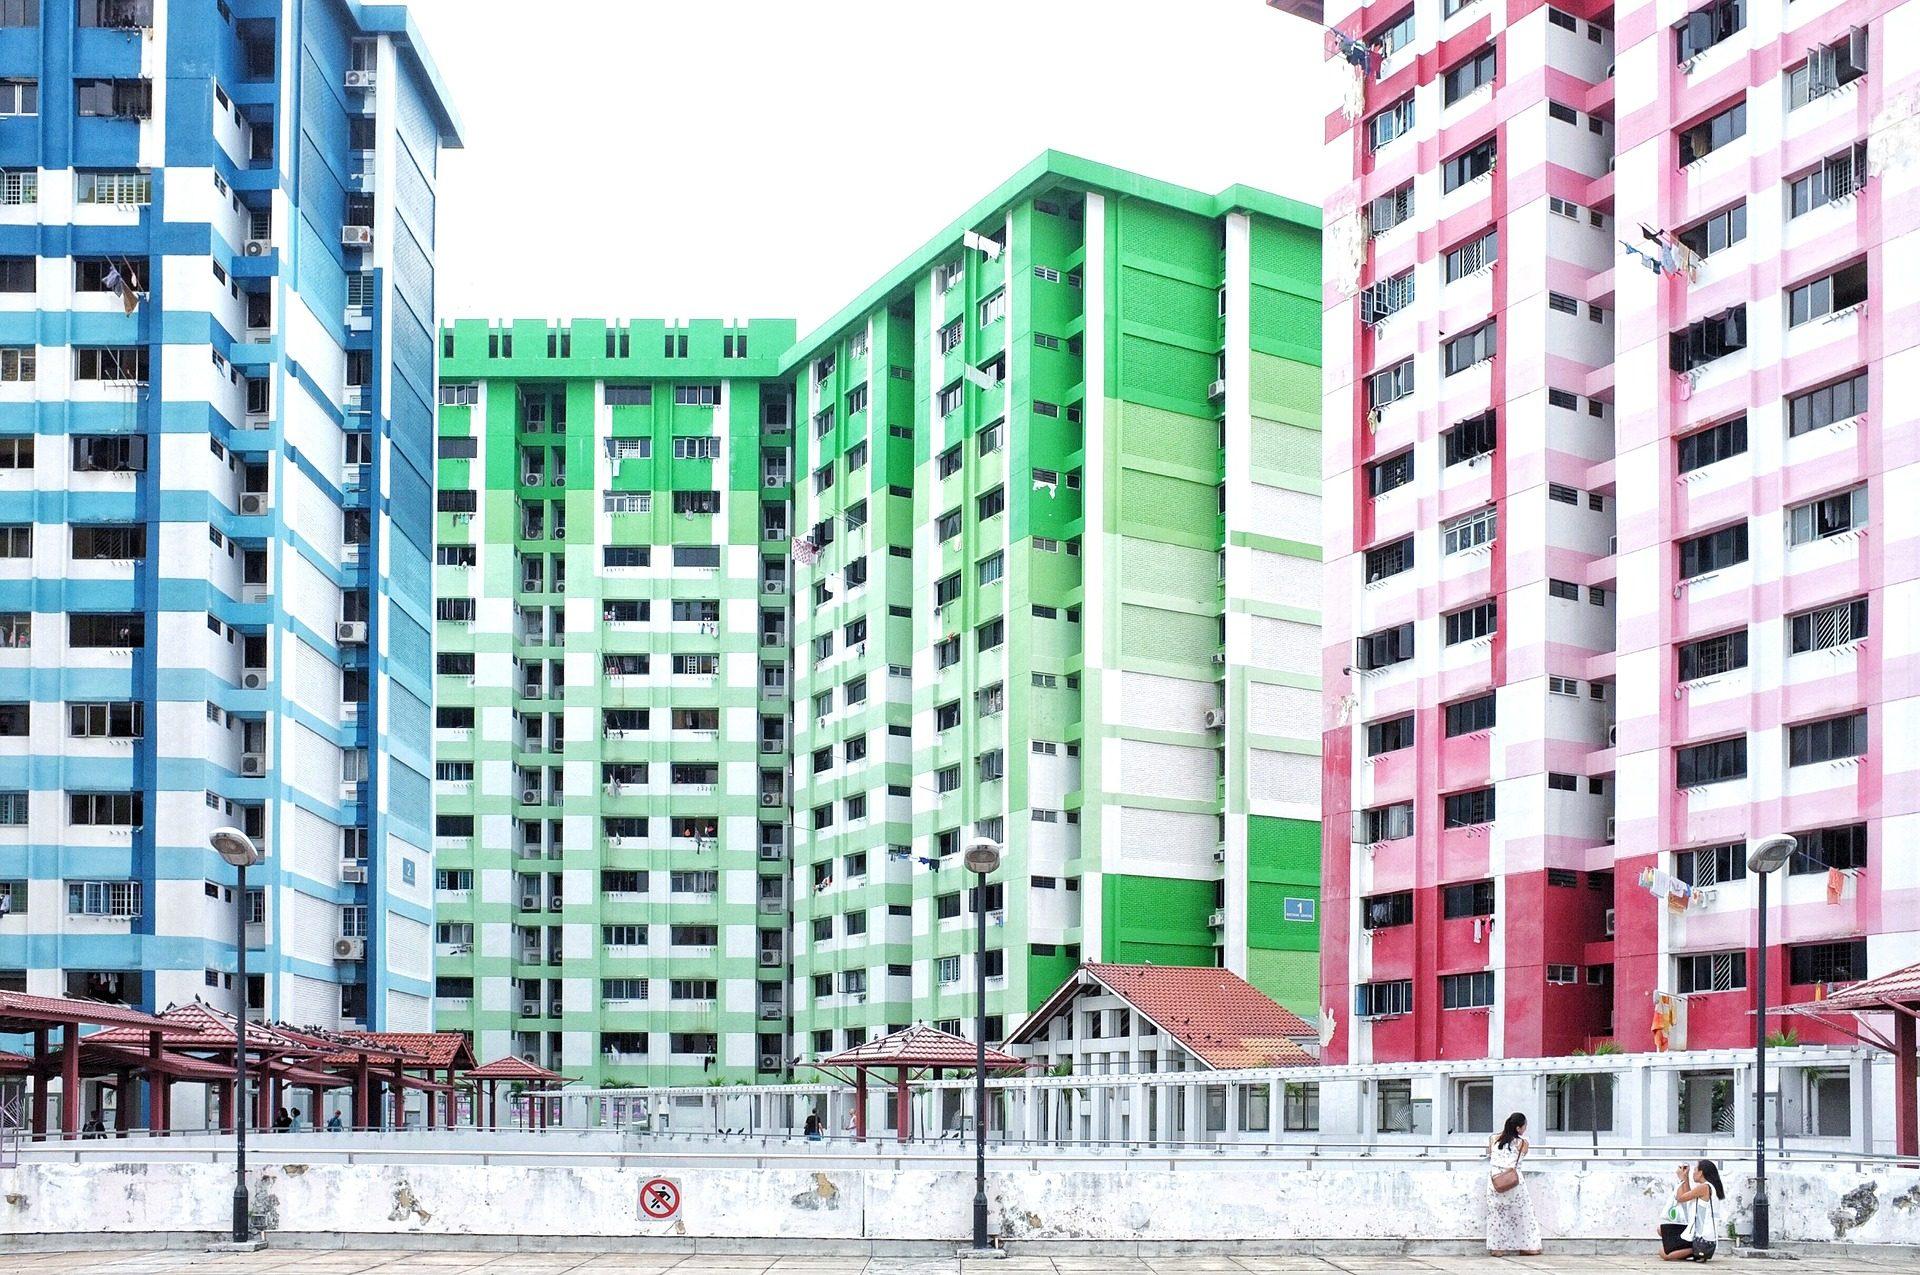 इमारतें, रंगीन, residenciales, वास्तुकला, Torres - HD वॉलपेपर - प्रोफेसर-falken.com